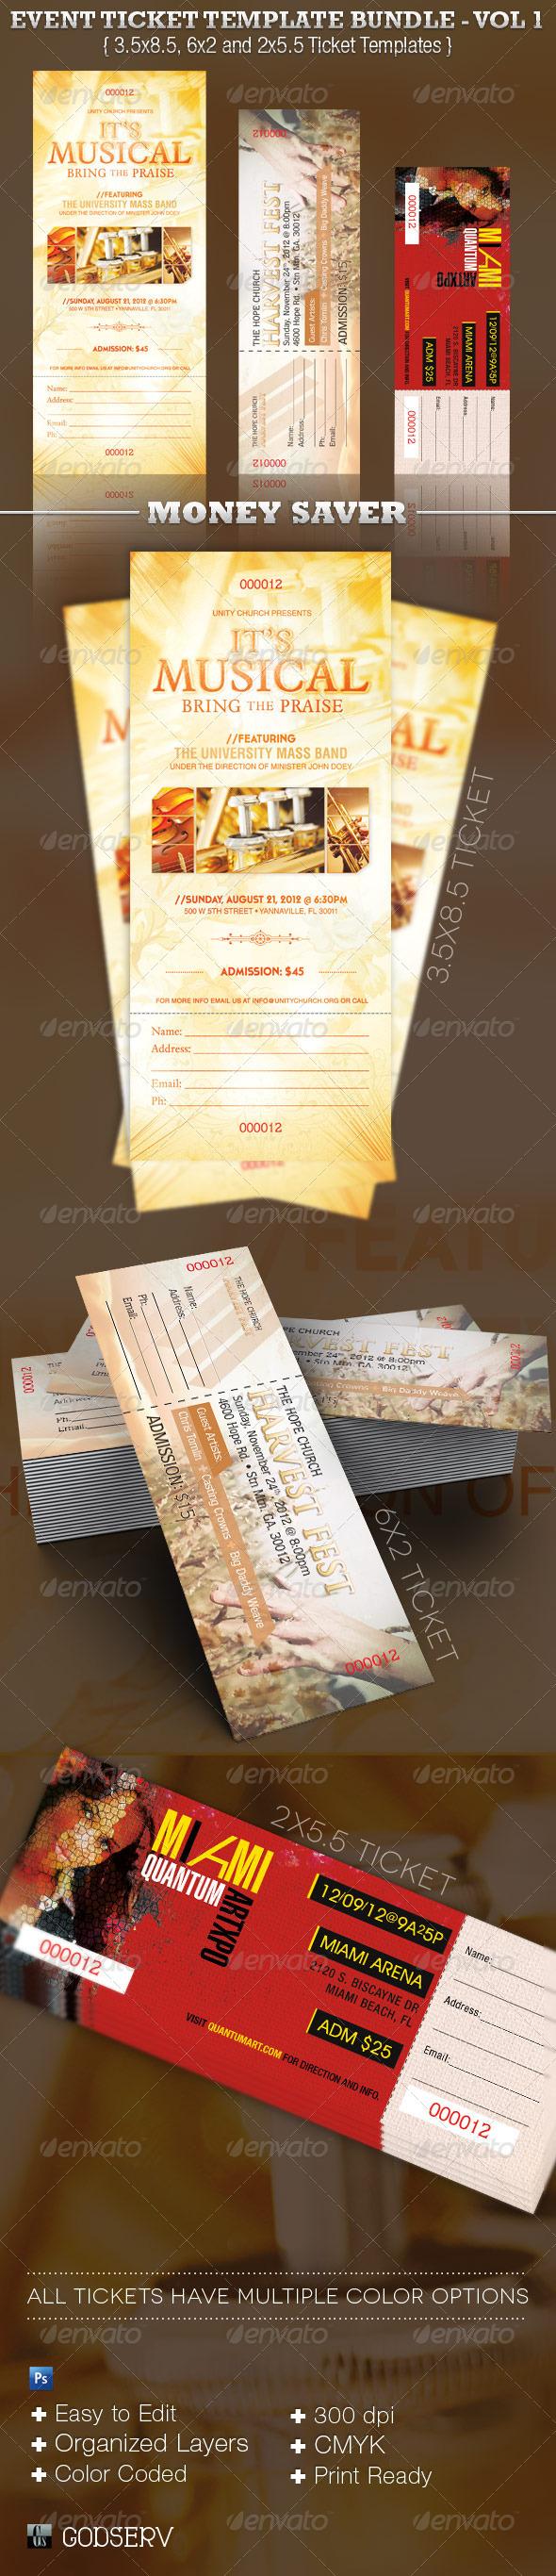 Event Ticket Template Bundle Vol 1 - Miscellaneous Print Templates